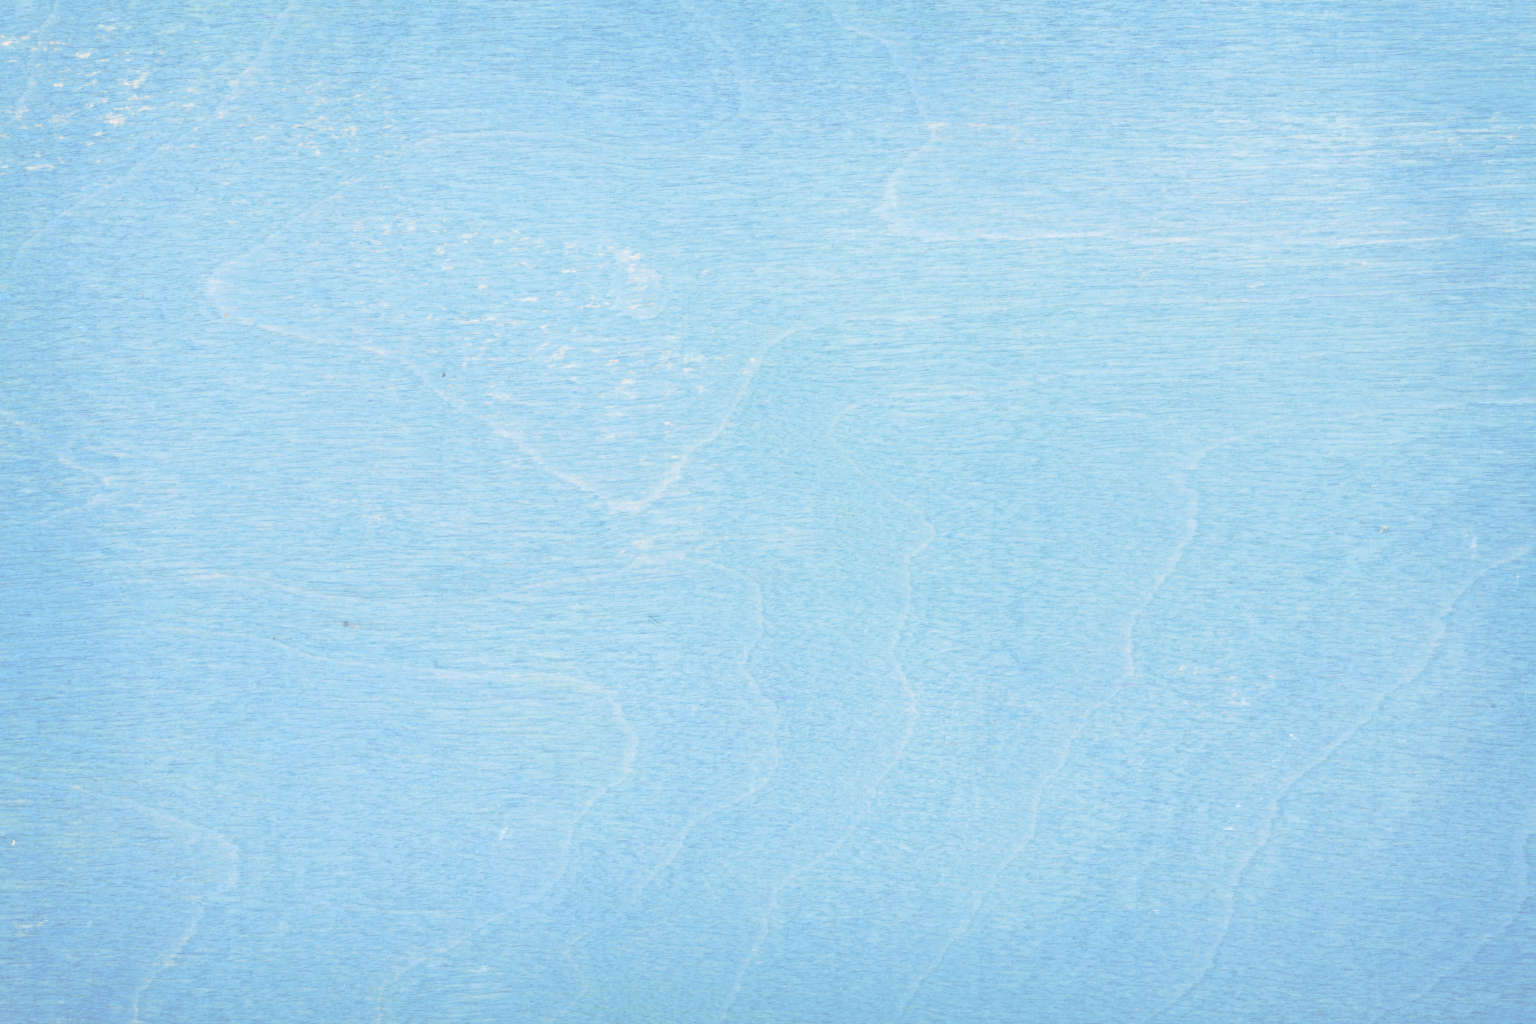 Blue Colored Wood